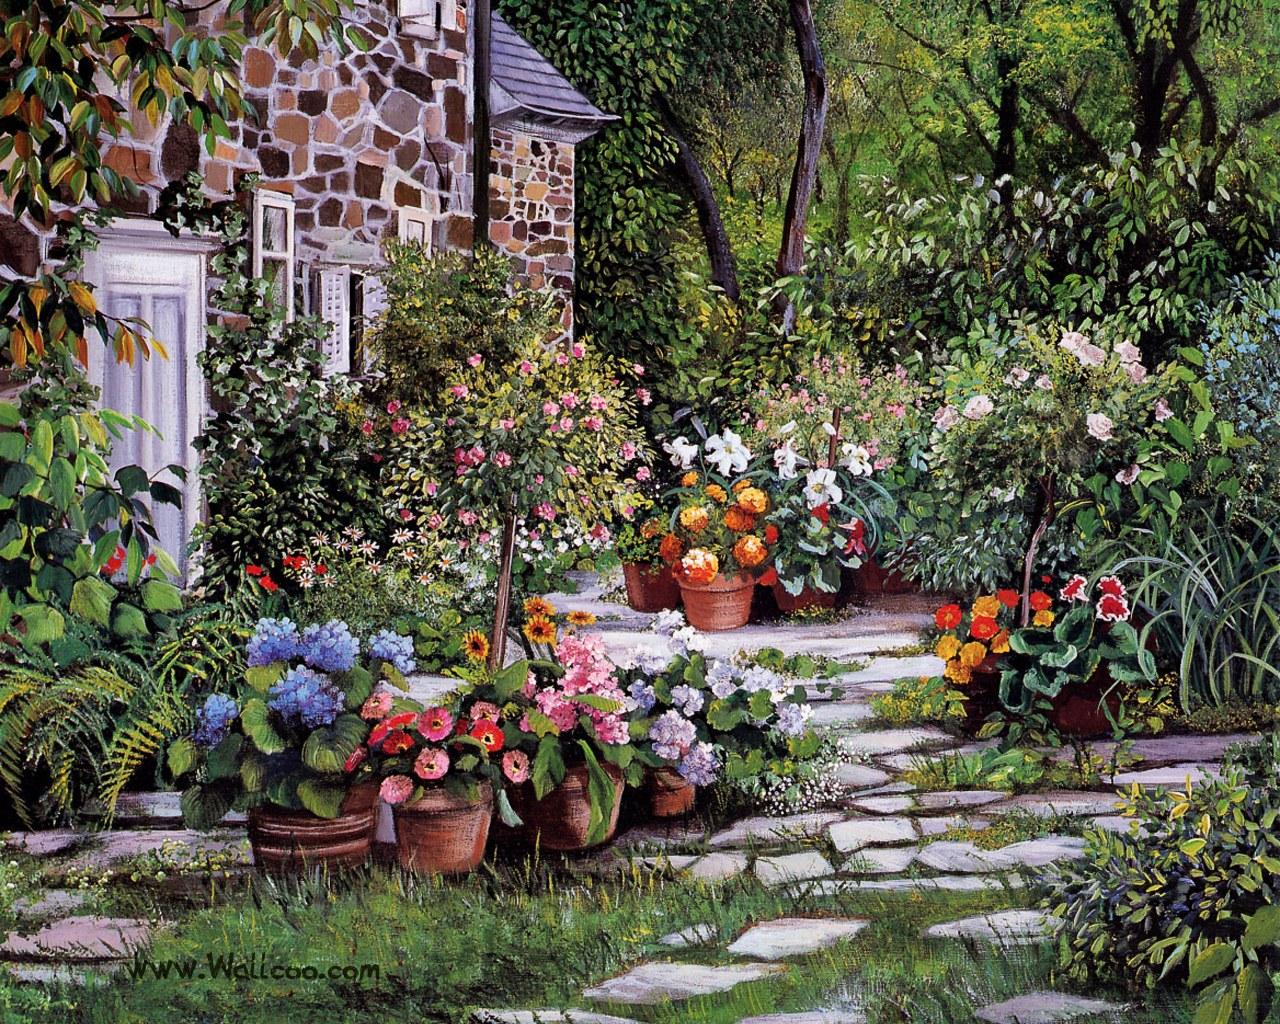 G rsel sanatlar deposu fine arts archive susan rios 39 la for Garden idea et 700